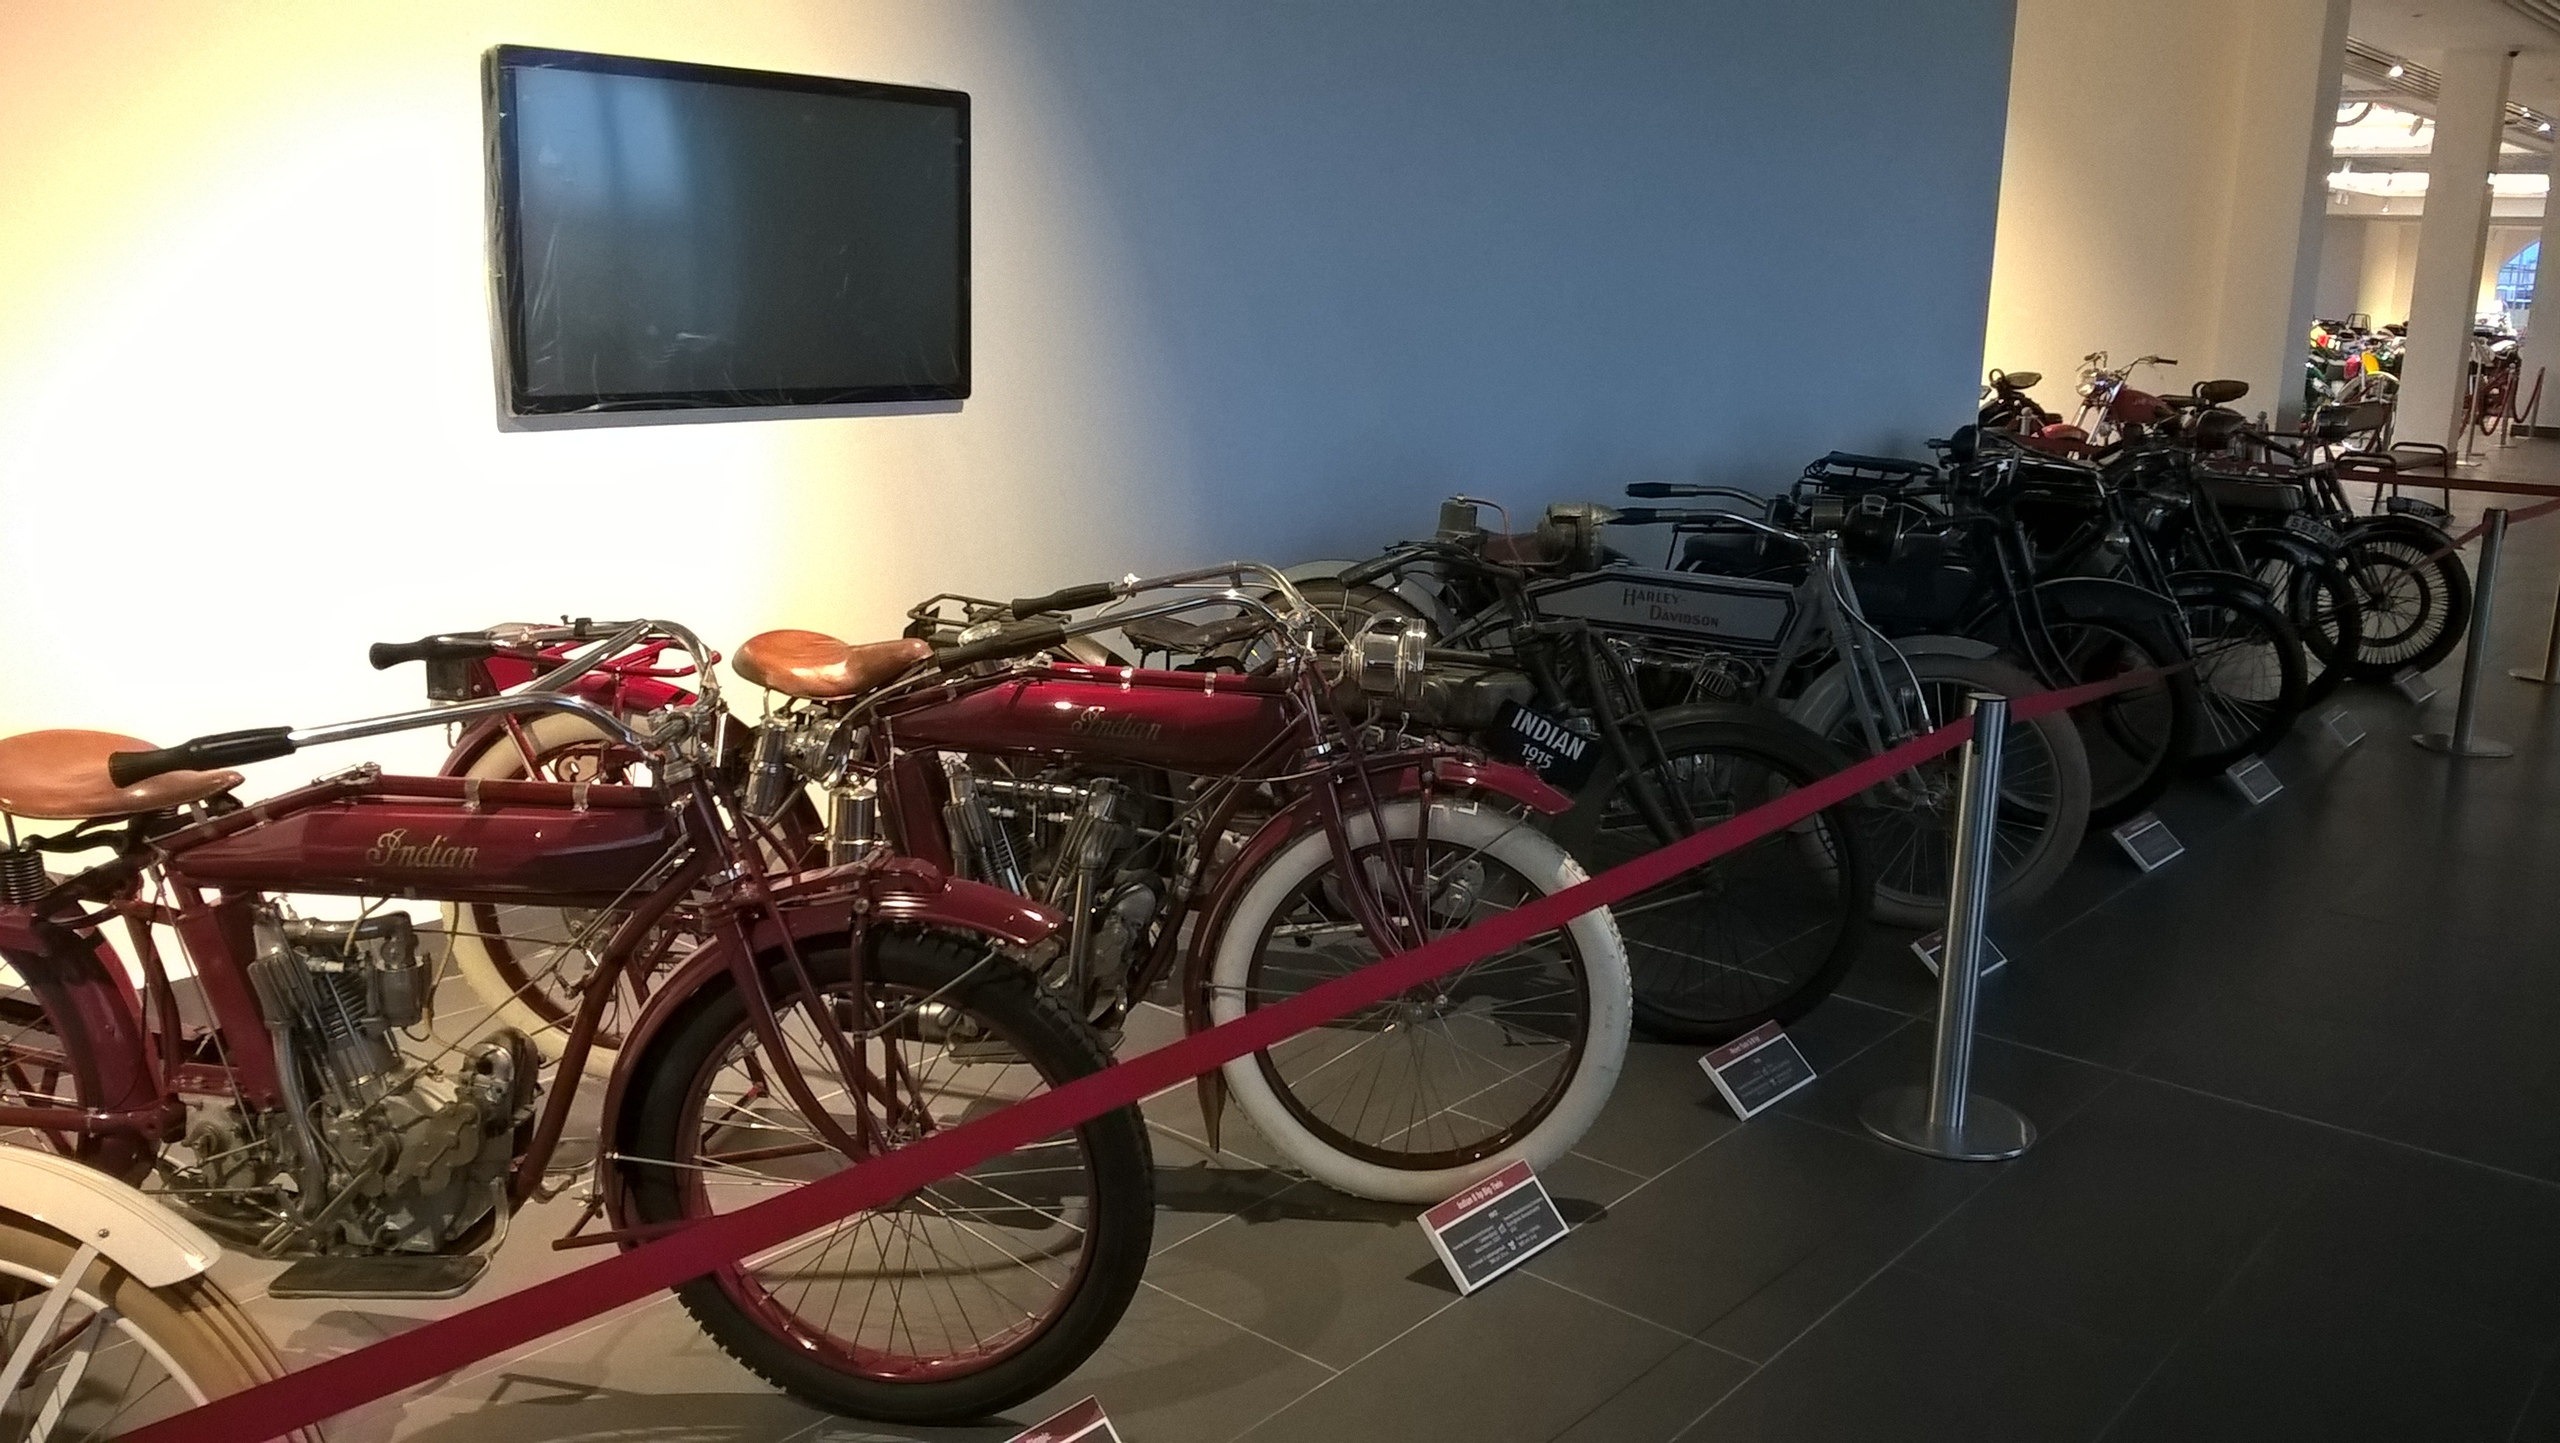 ретро-мотоциклы в музее ретро-автомобилей